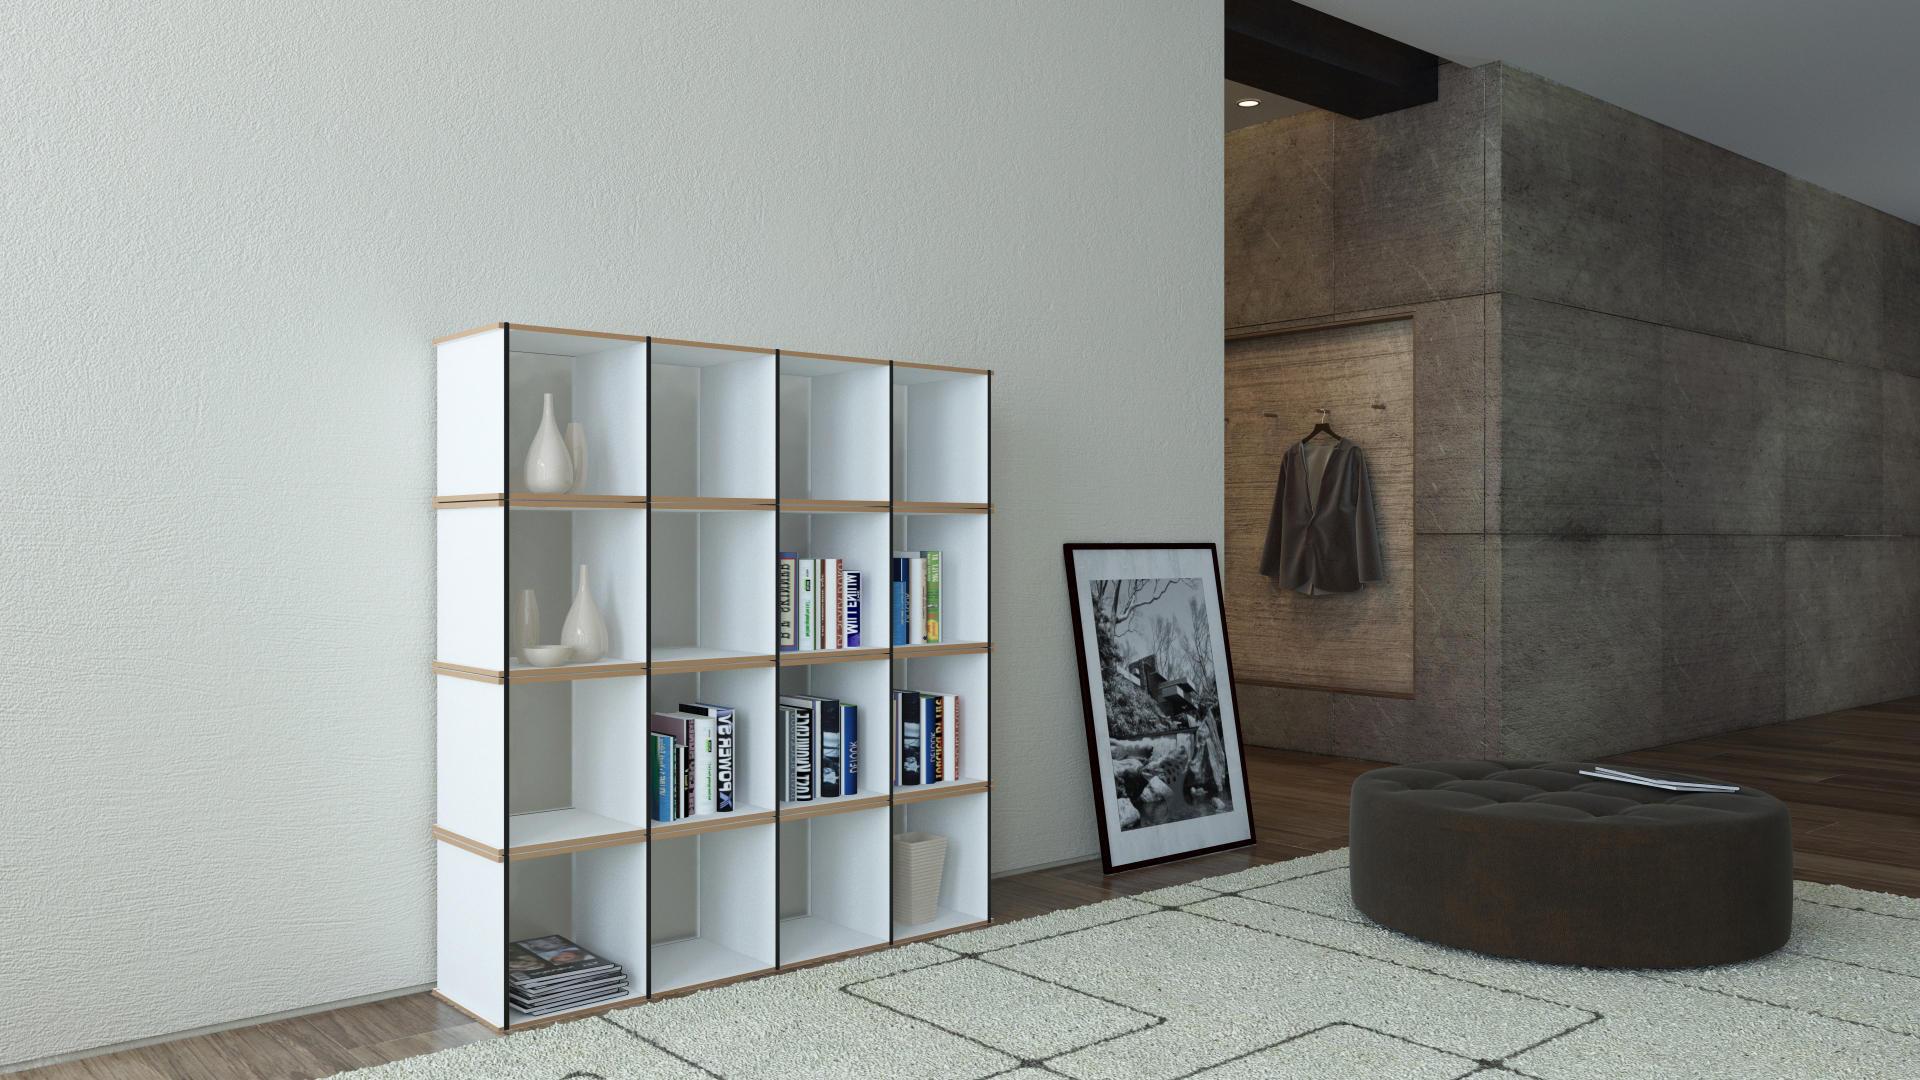 tojo aktenpack b roregalsysteme von tojo m bel architonic. Black Bedroom Furniture Sets. Home Design Ideas